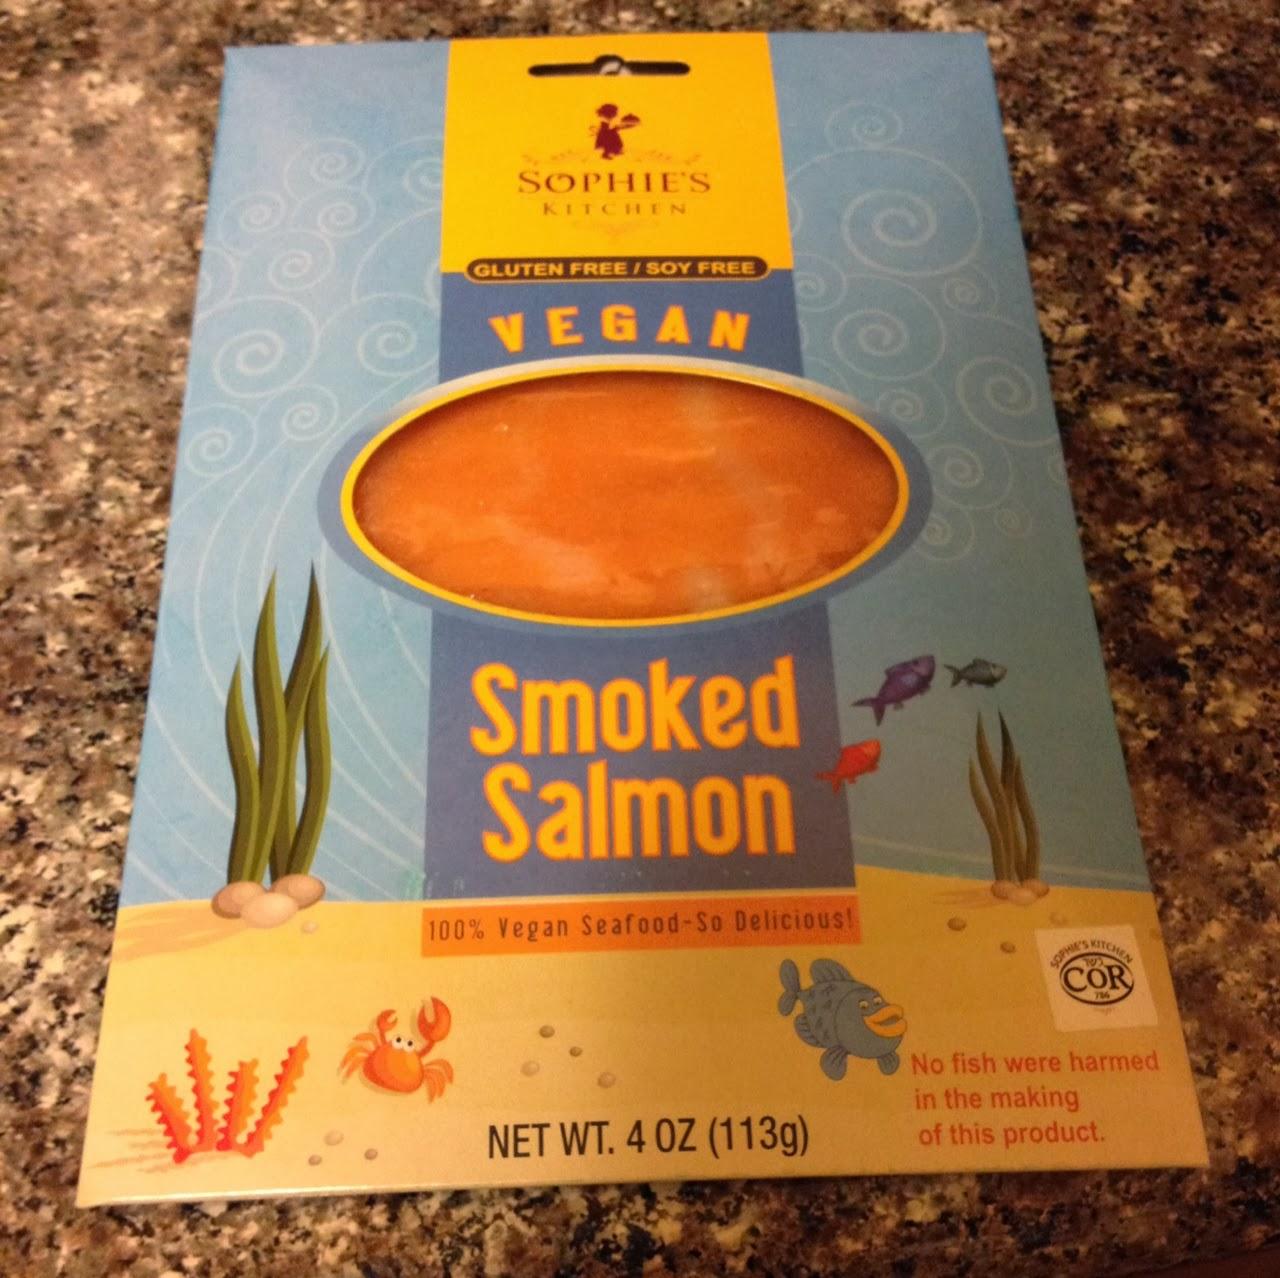 Sophie S Kitchen Vegan Smoked Salmon